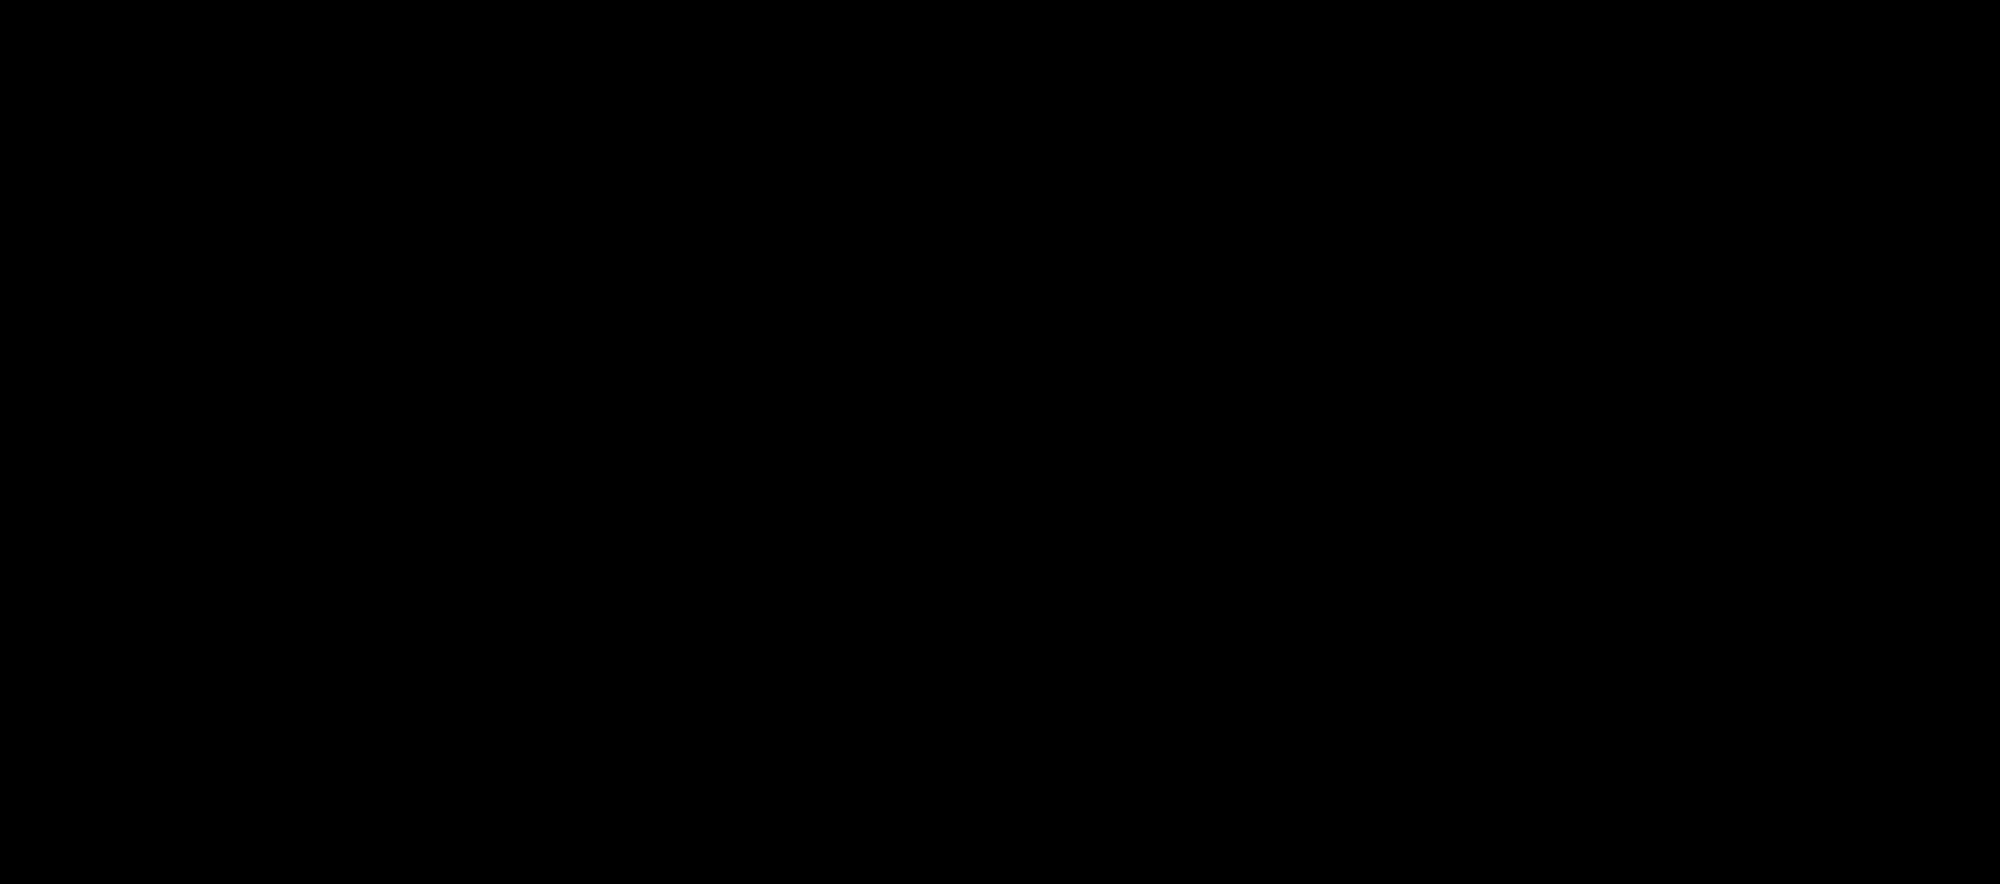 Chloe Rae Designs-logo-black.png